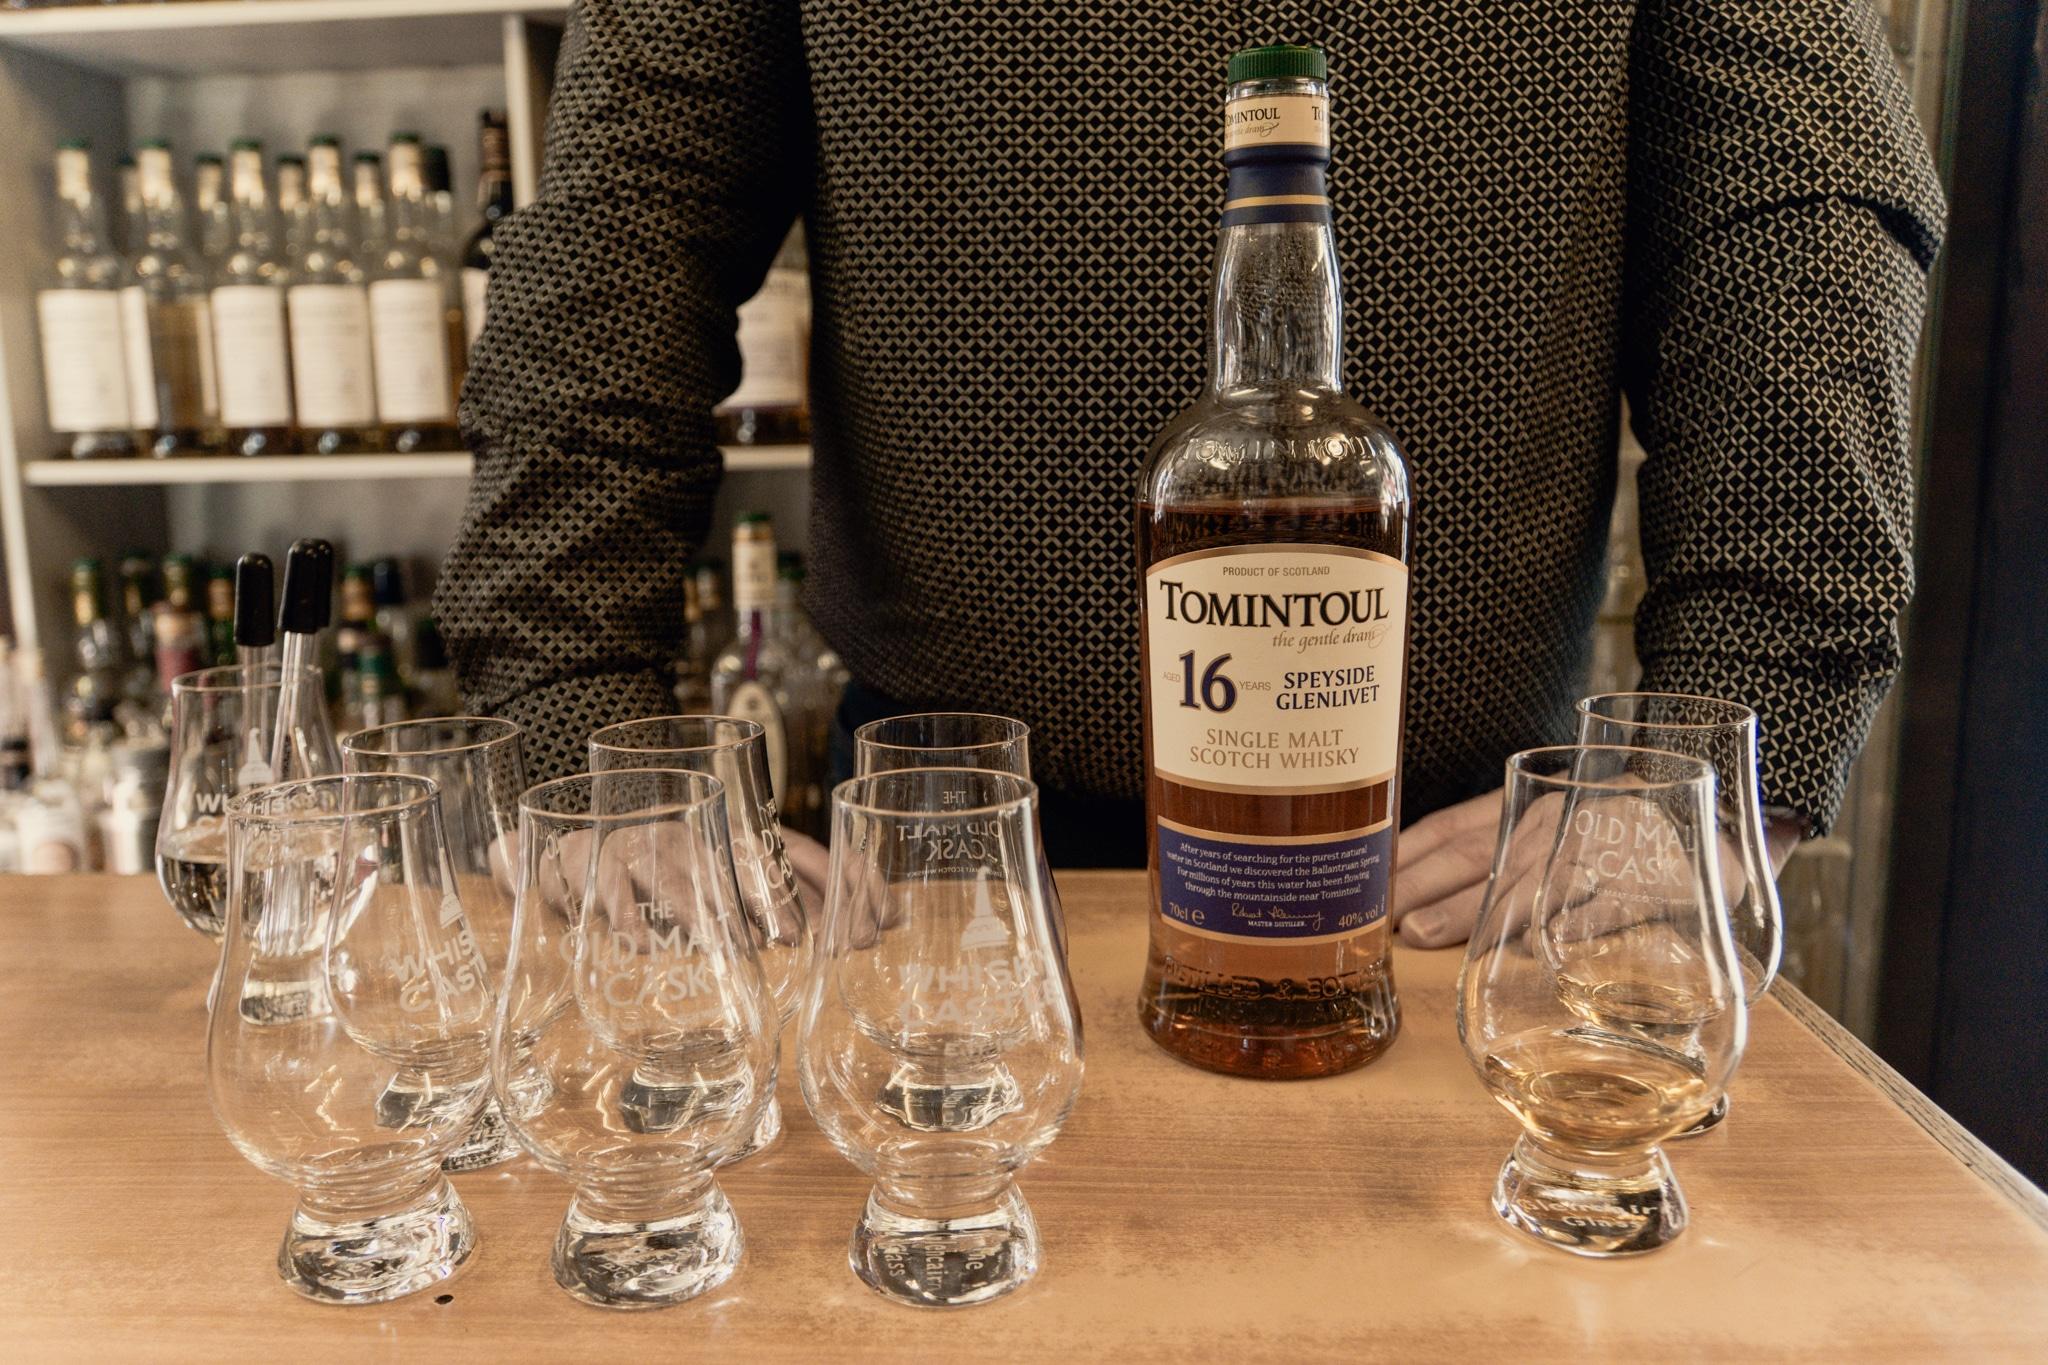 Cairngorms Nationalpark: Die SnowRoads Scenic Route in den Highlands - Whisky Tasting im Whisky Castle